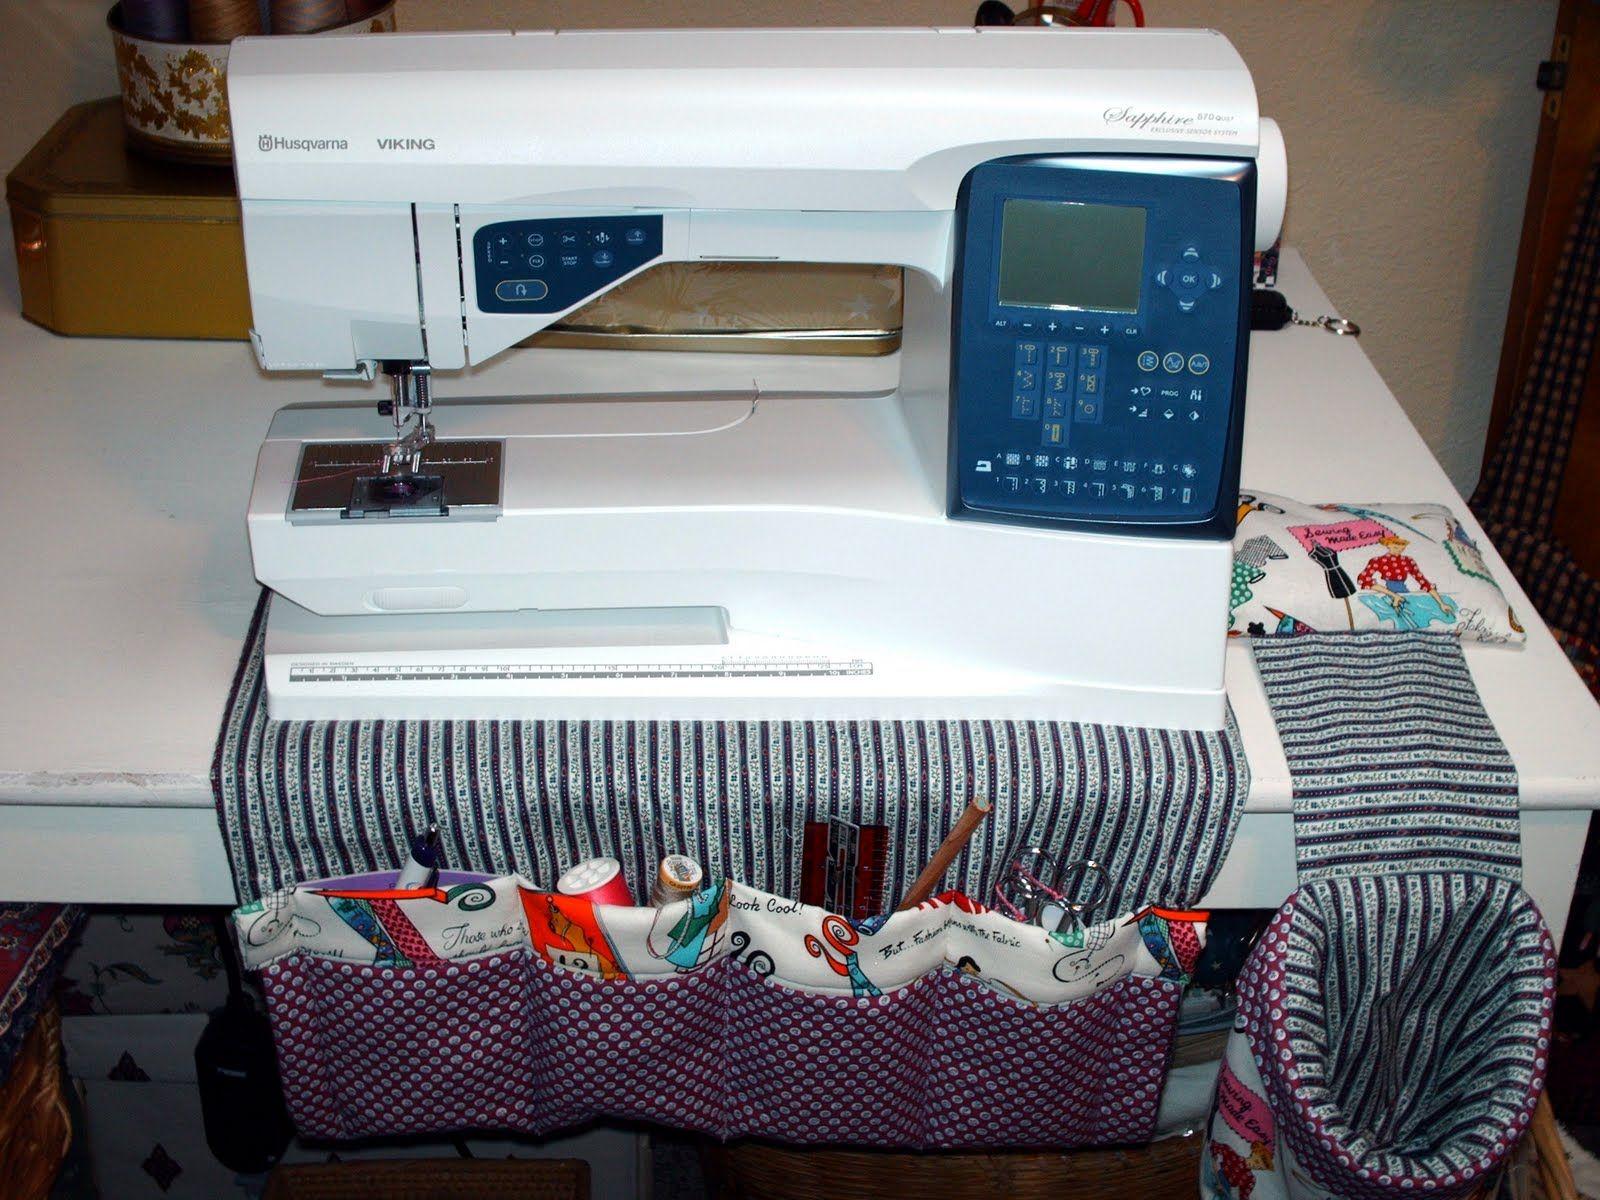 sewing+machine+mat+and+pockets.JPG (1600×1200)